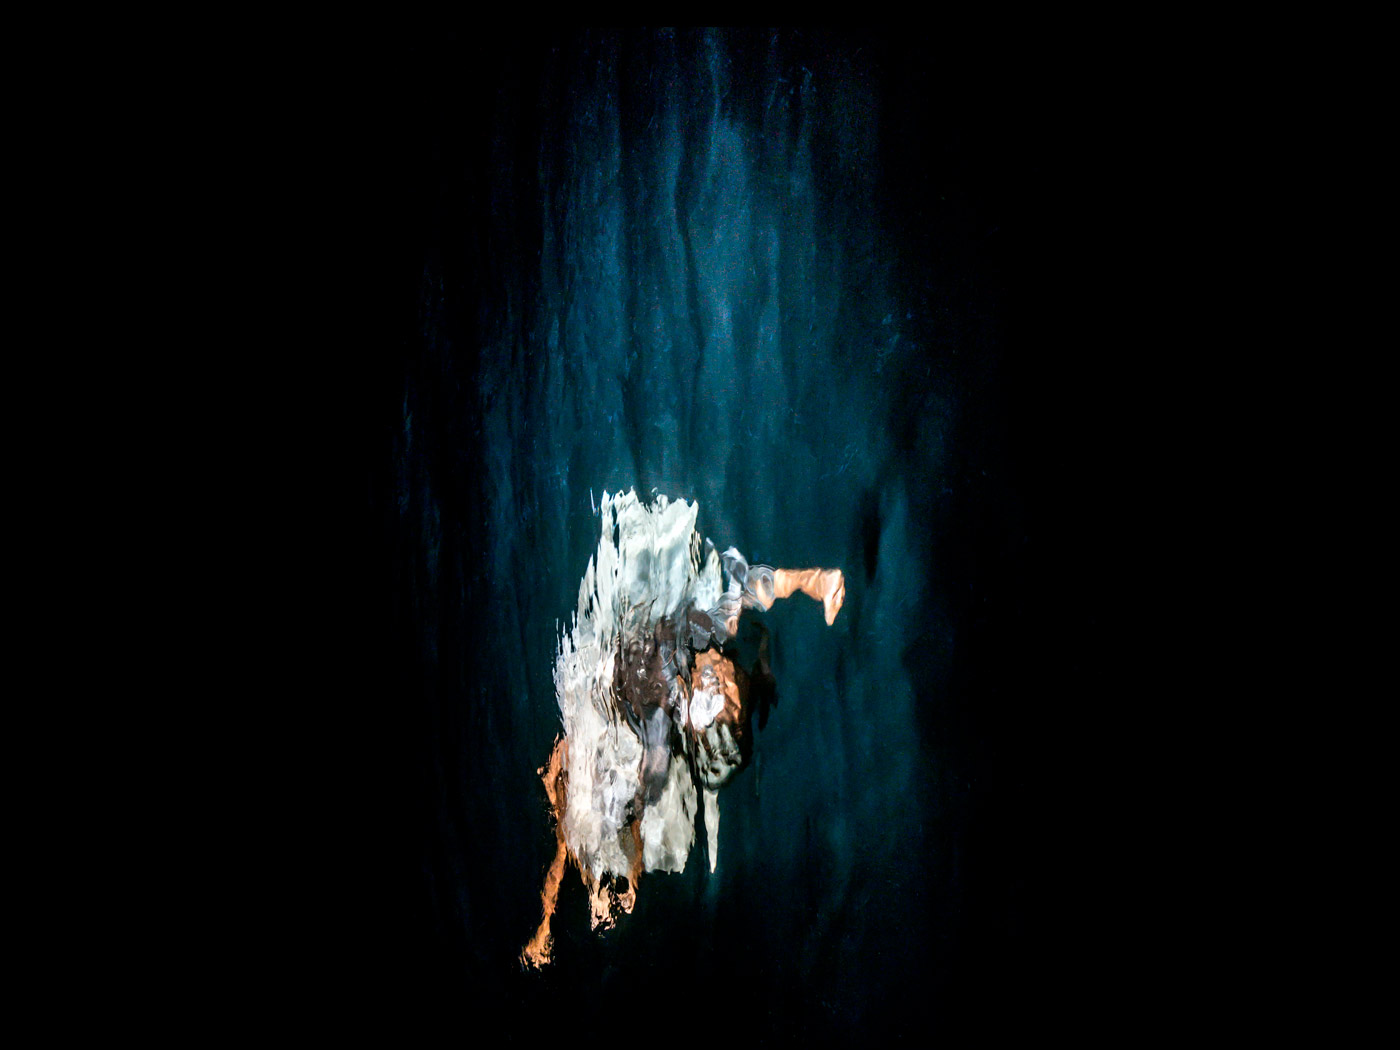 underwater figurative fine art photographer